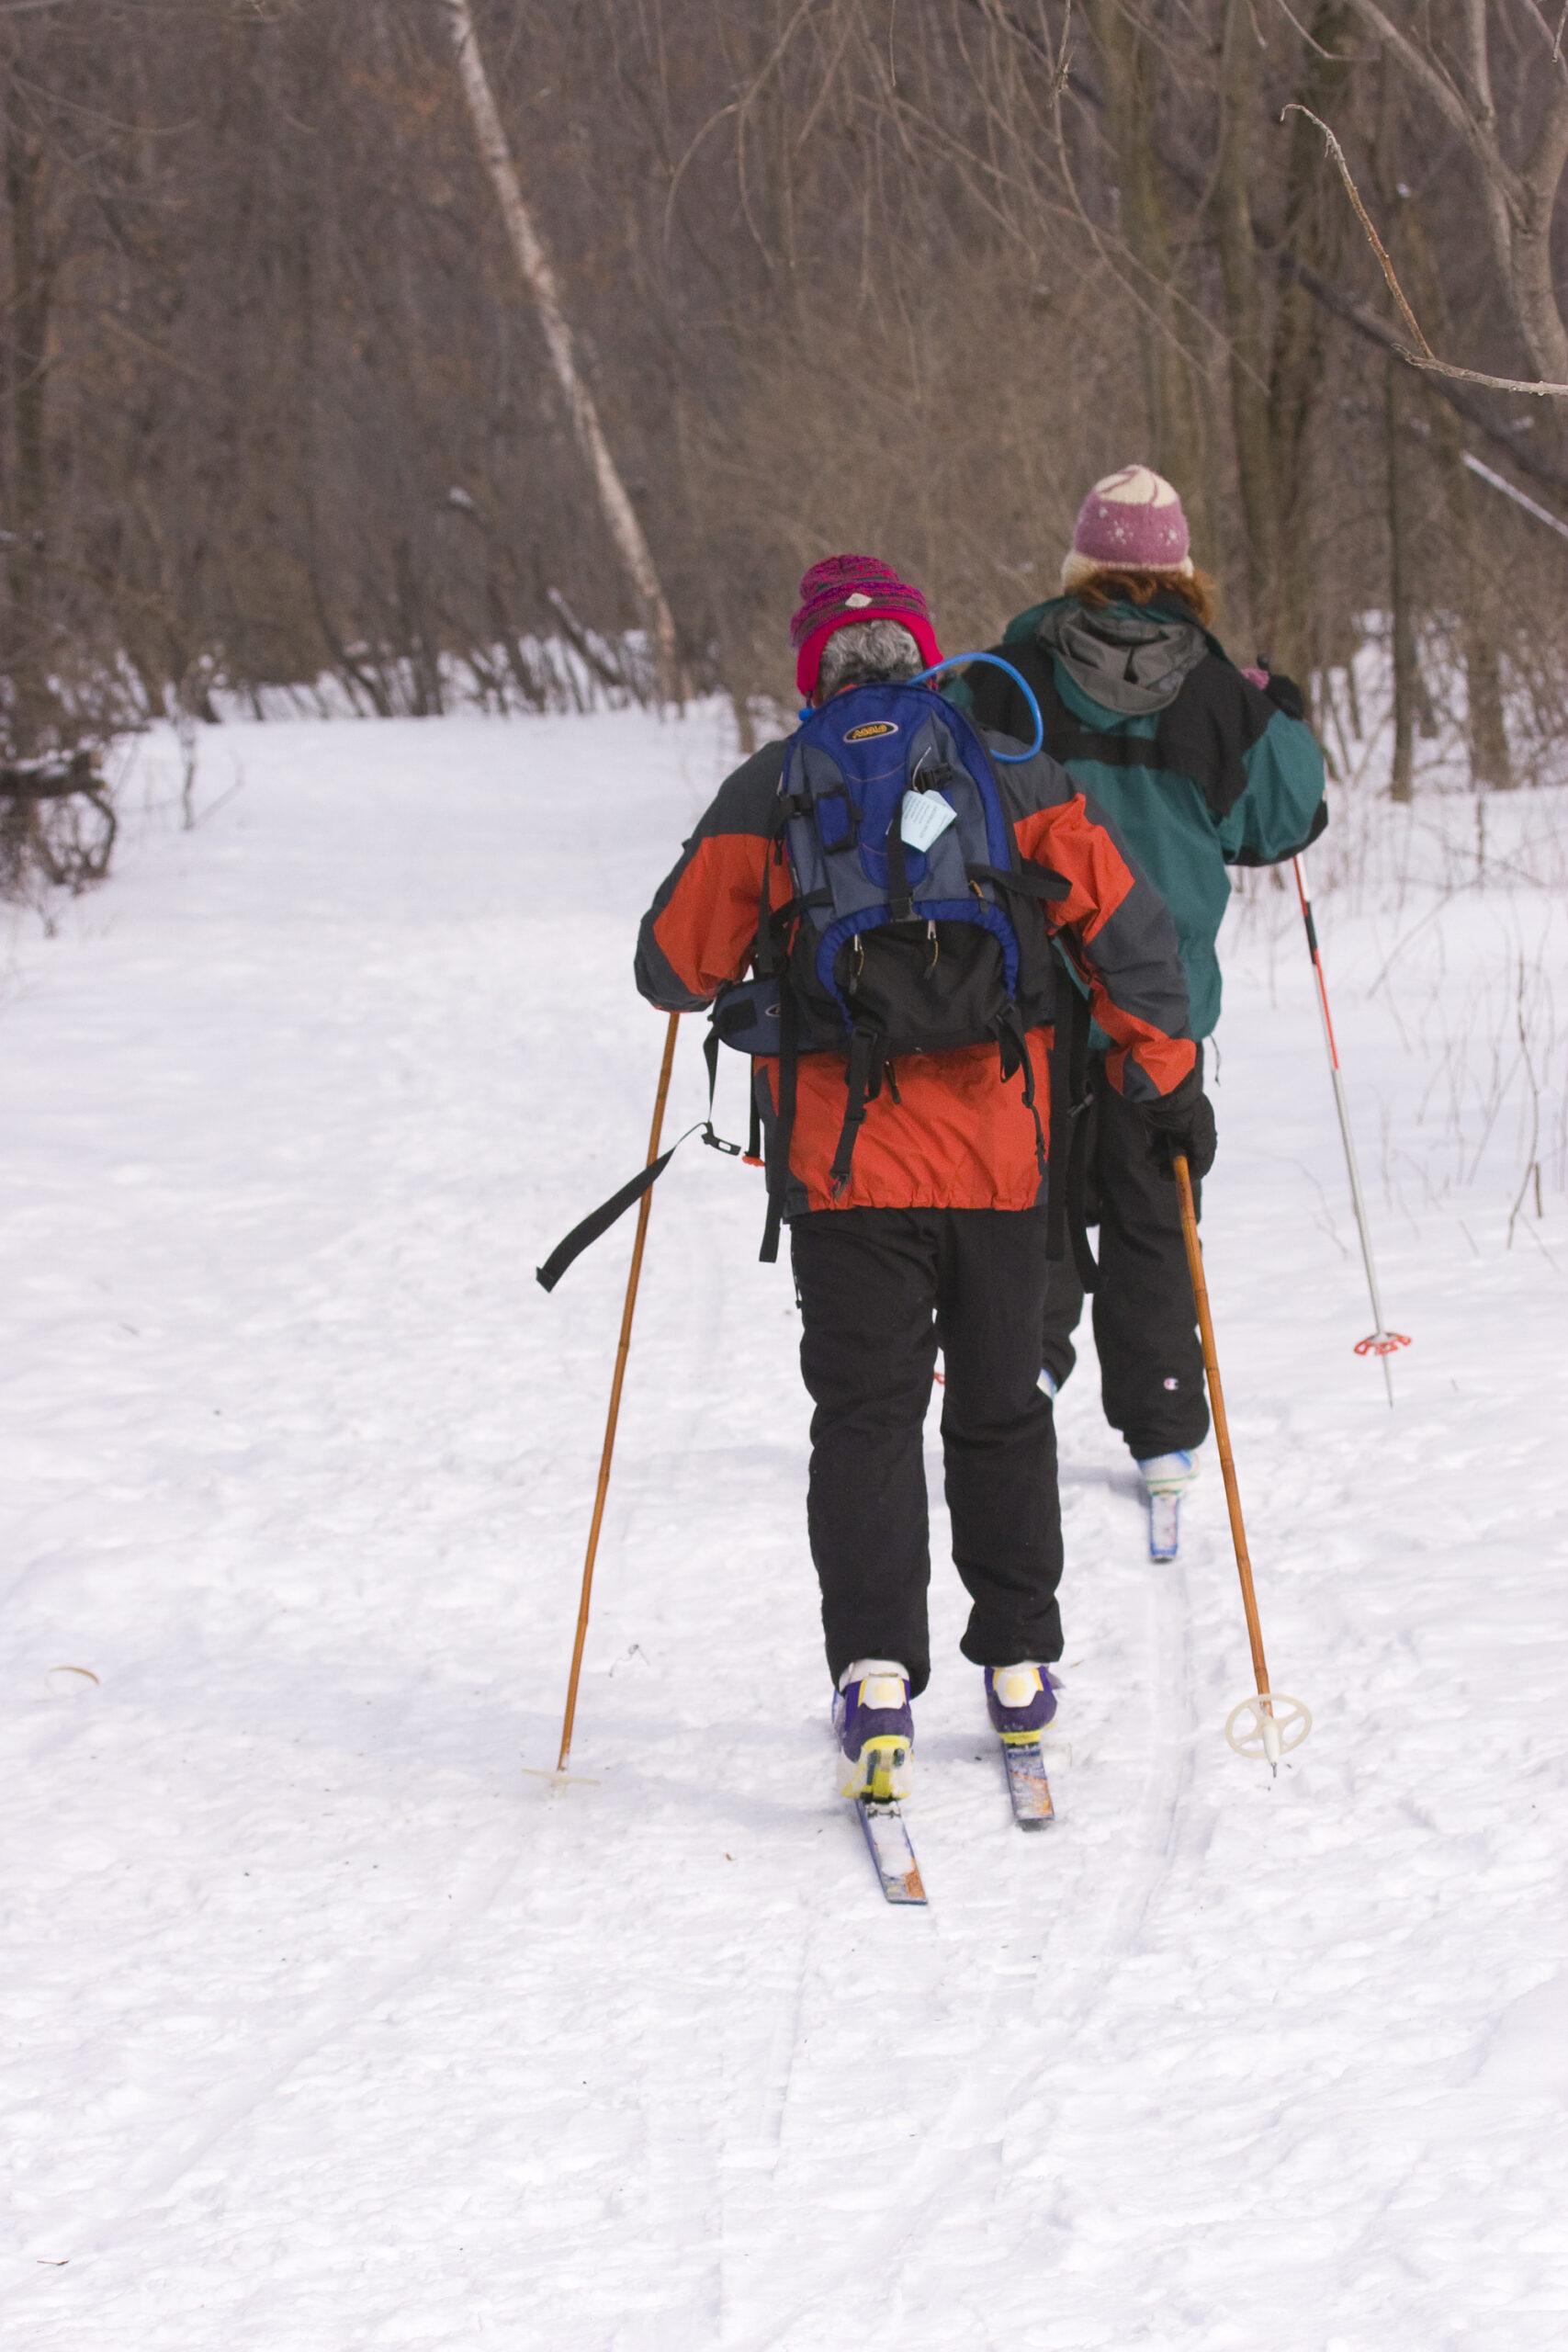 Deux adeptes du ski de fond